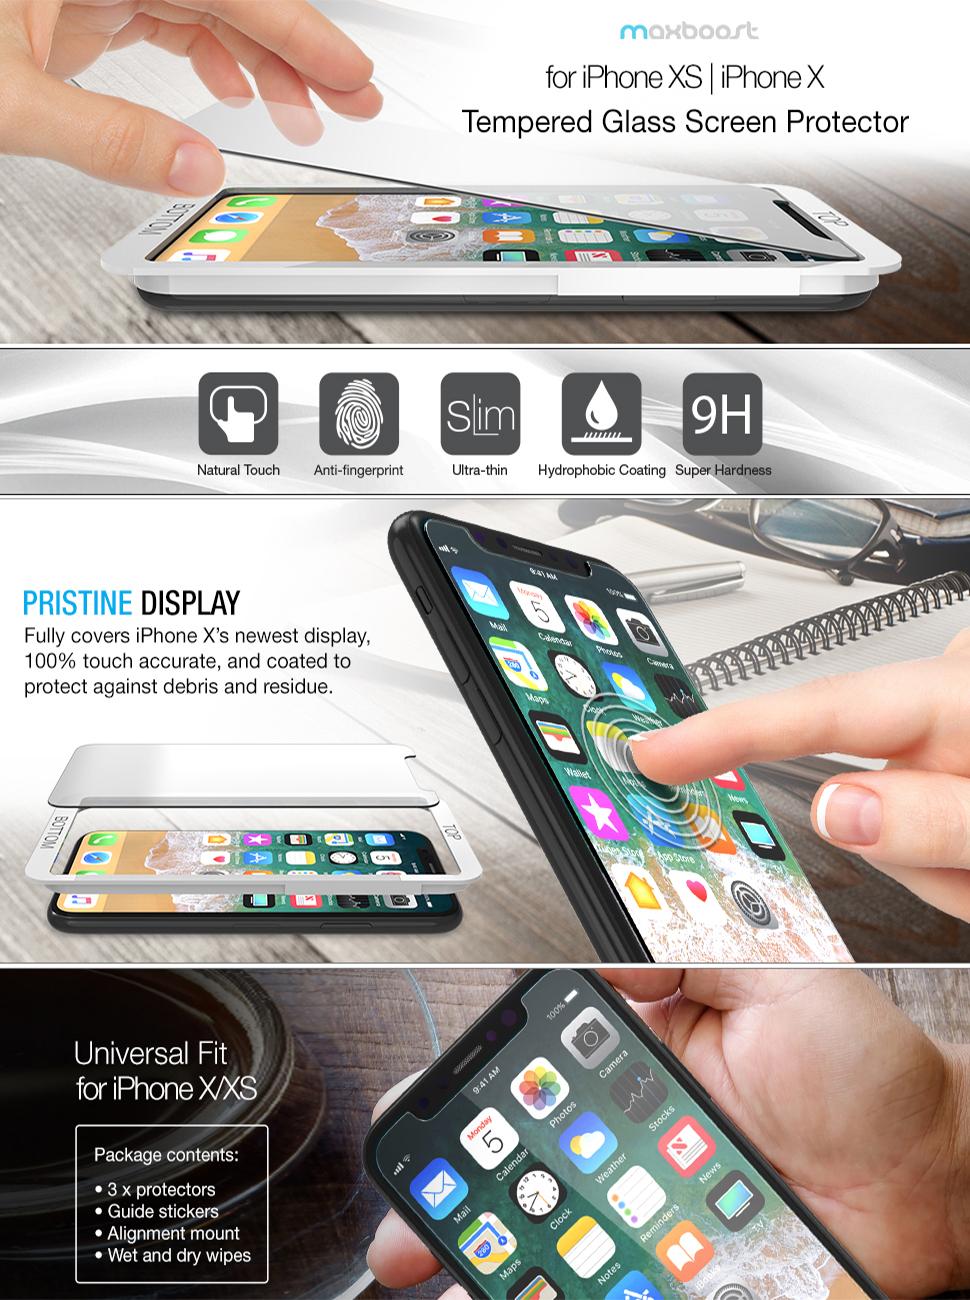 Maxboost iPhone XS Screen Protector / iPhone X Screen Protector